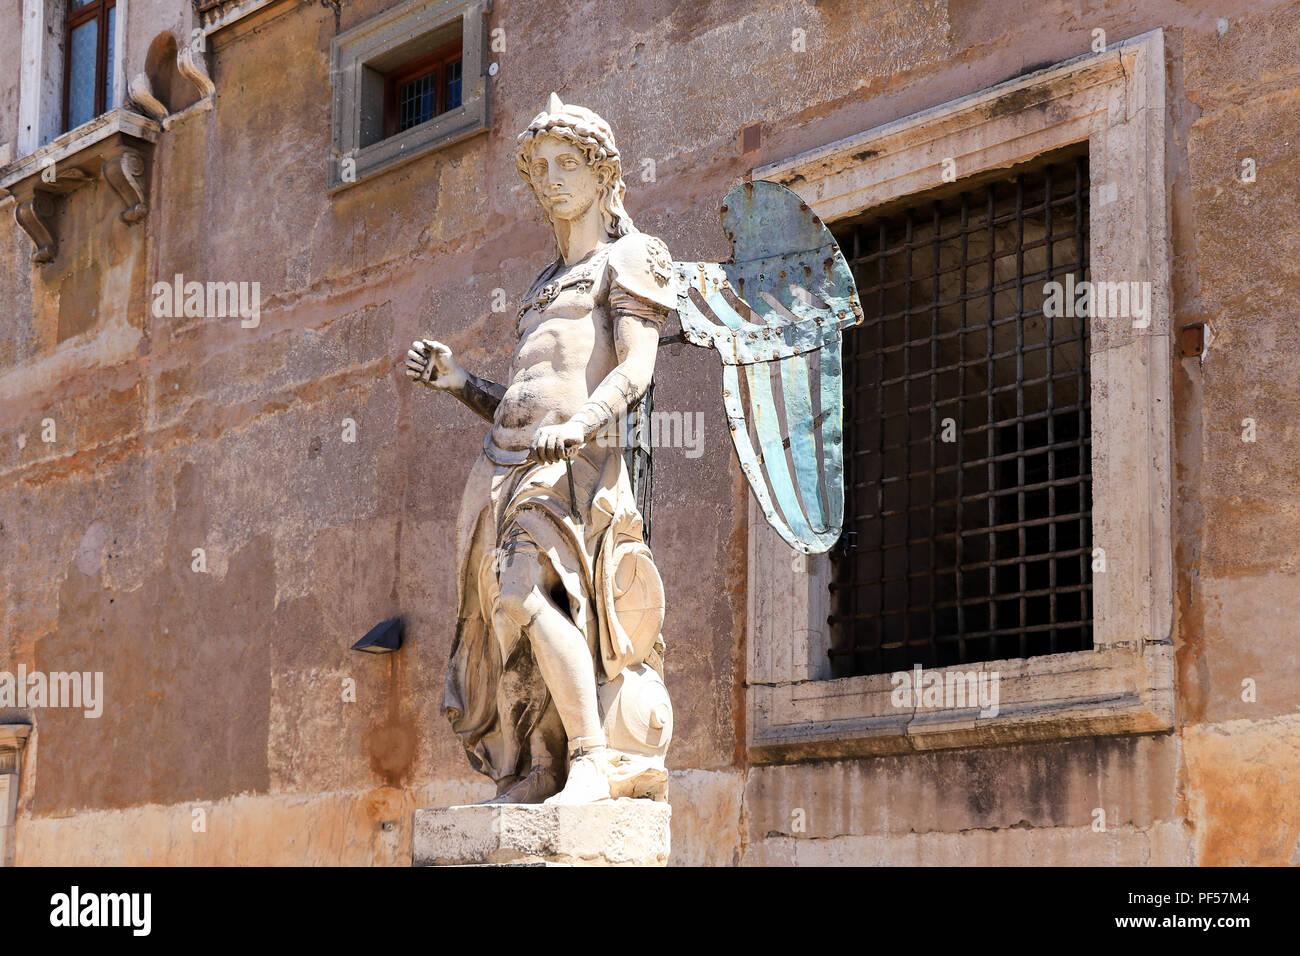 Saint Michael archangel sculpture at the ancient Castel Sant'Angelo, Rome, Italy - Stock Image